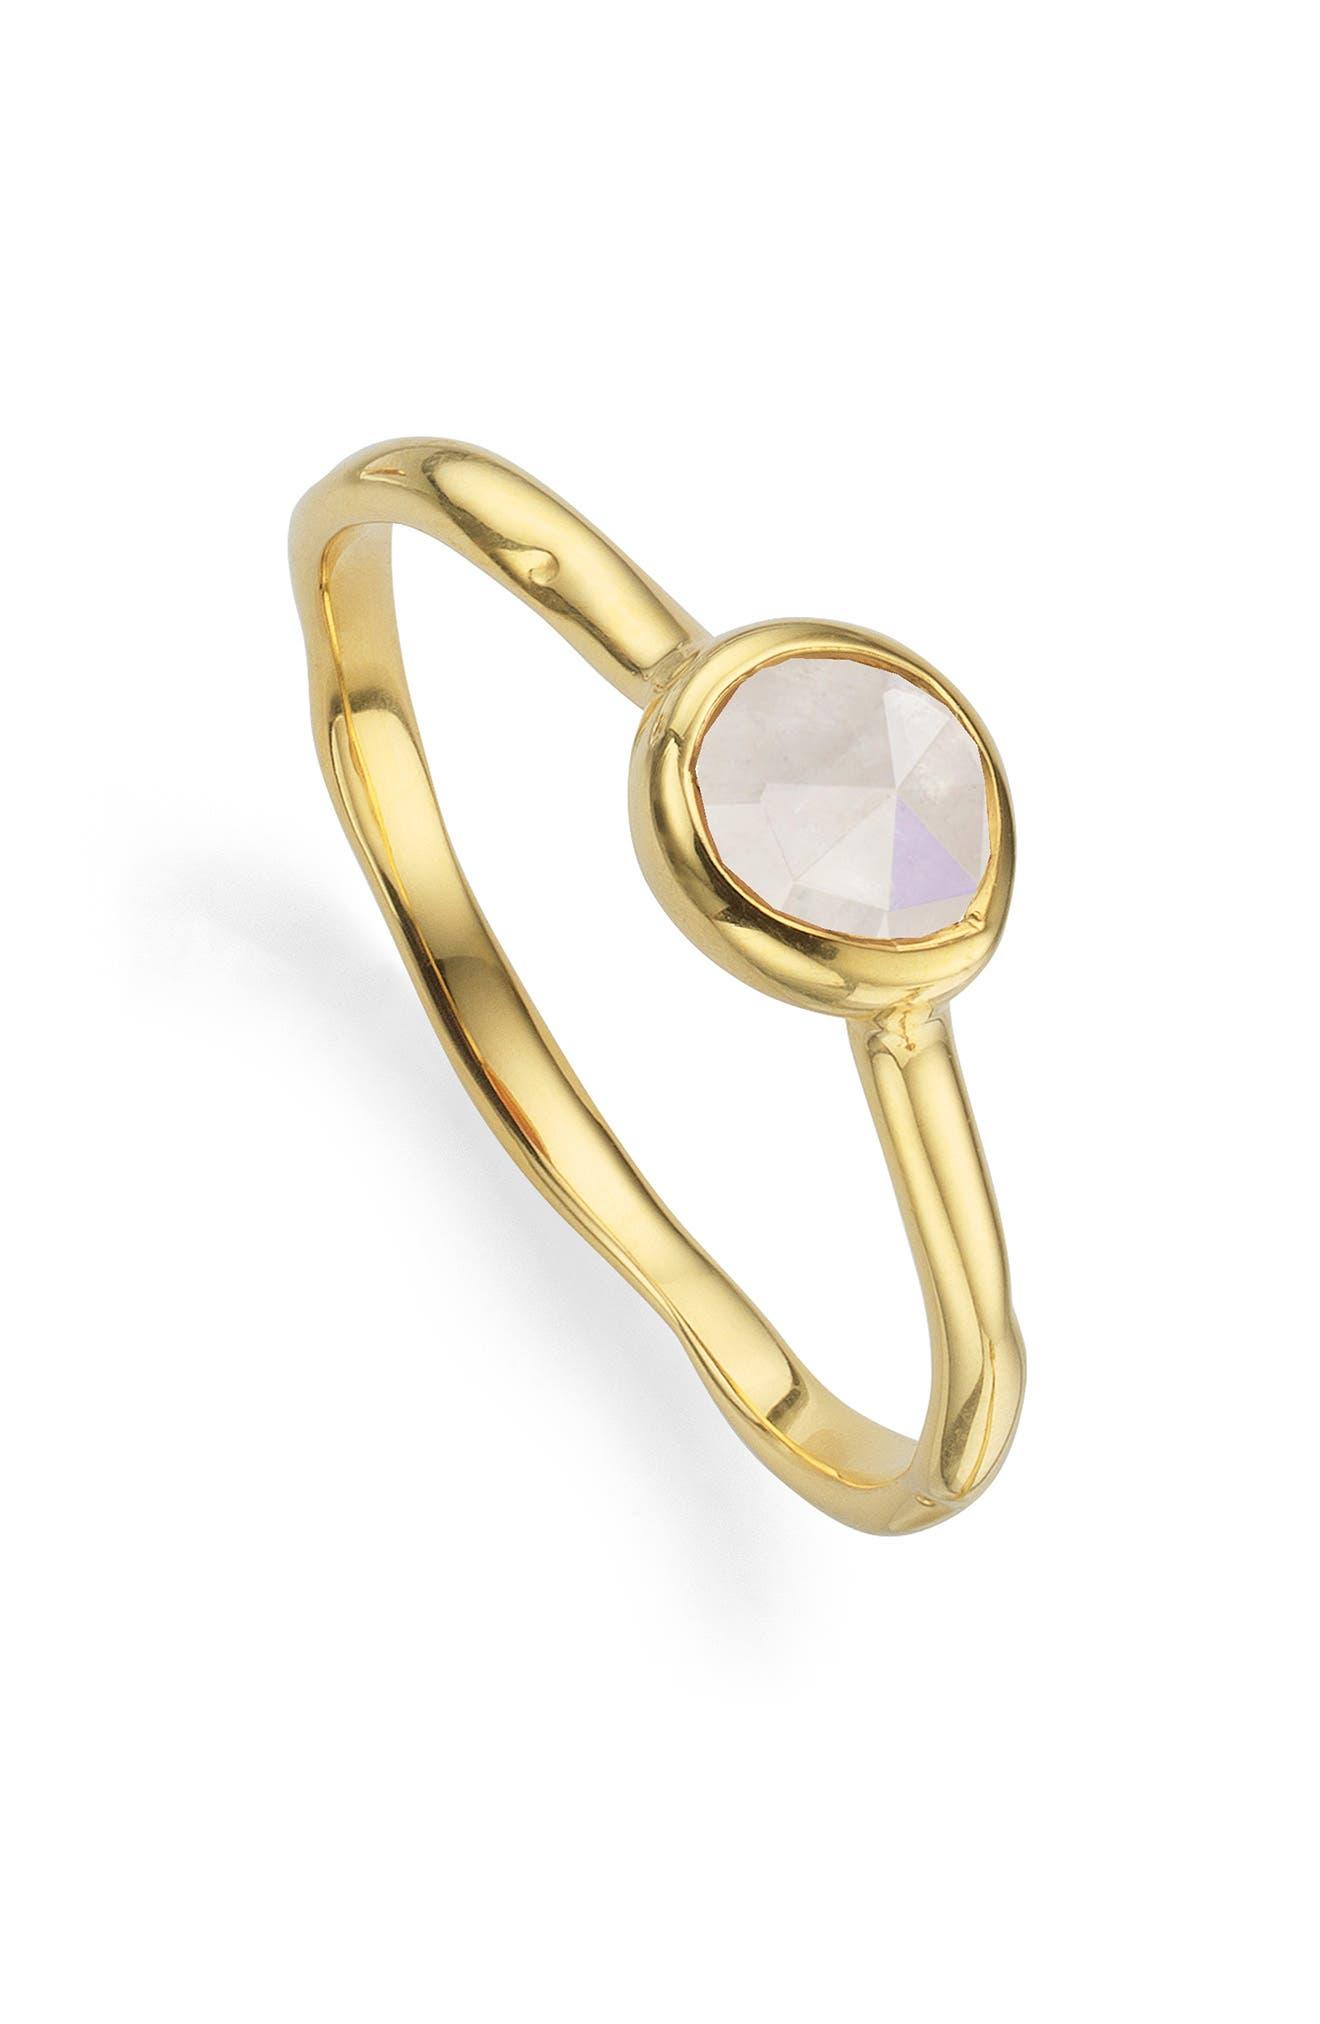 Siren Small Semiprecious Stone Stacking Ring,                         Main,                         color, GOLD/ MOONSTONE